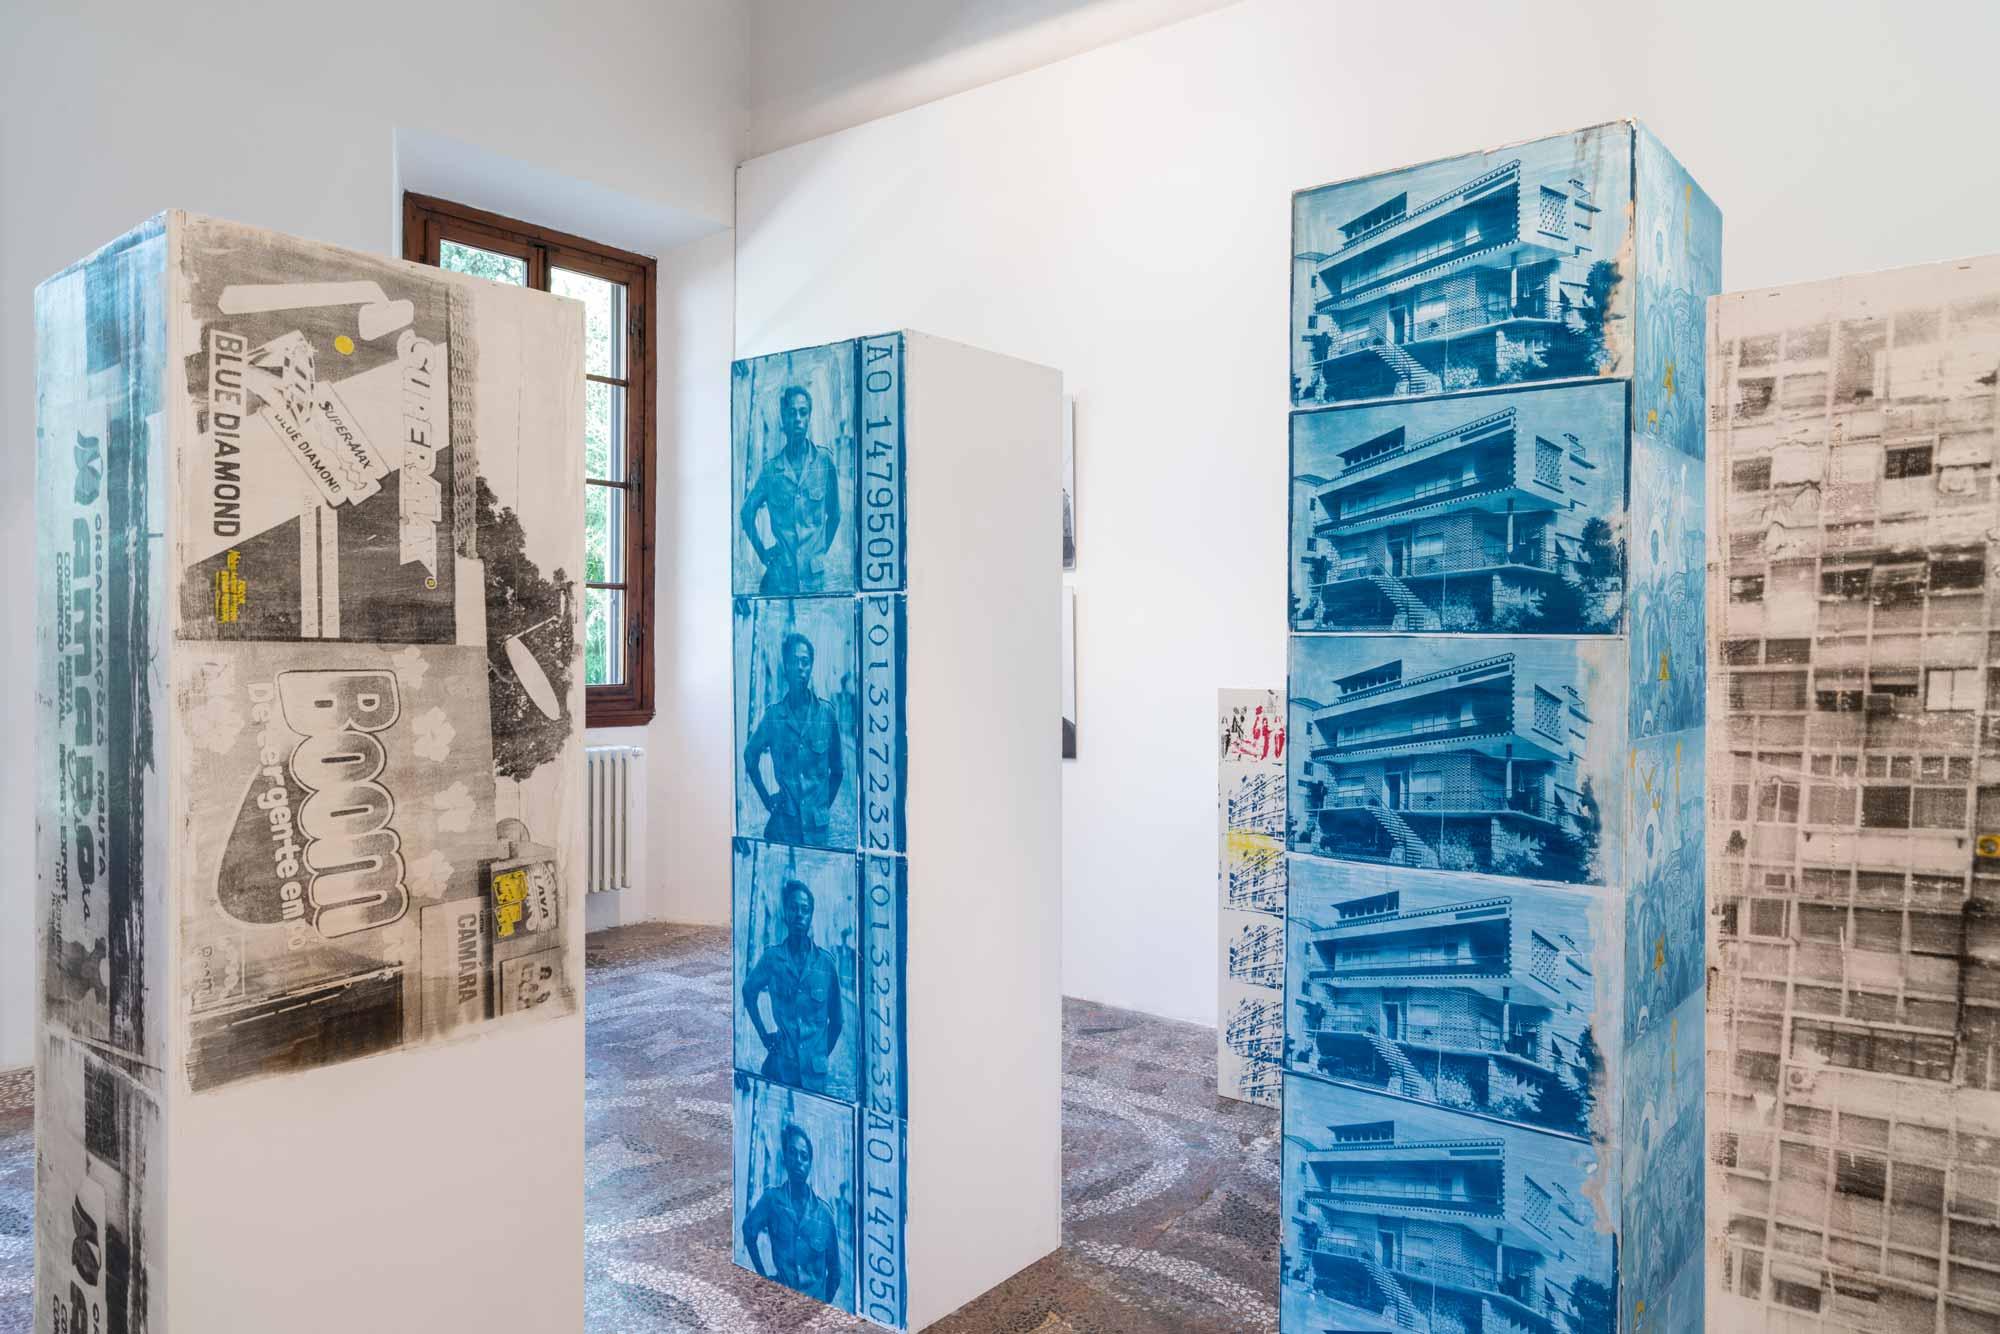 Delio_Jasse, <em>The place to be</em>, 2015, Villa Romana, Florence, 2018; photo: OKNOstudio